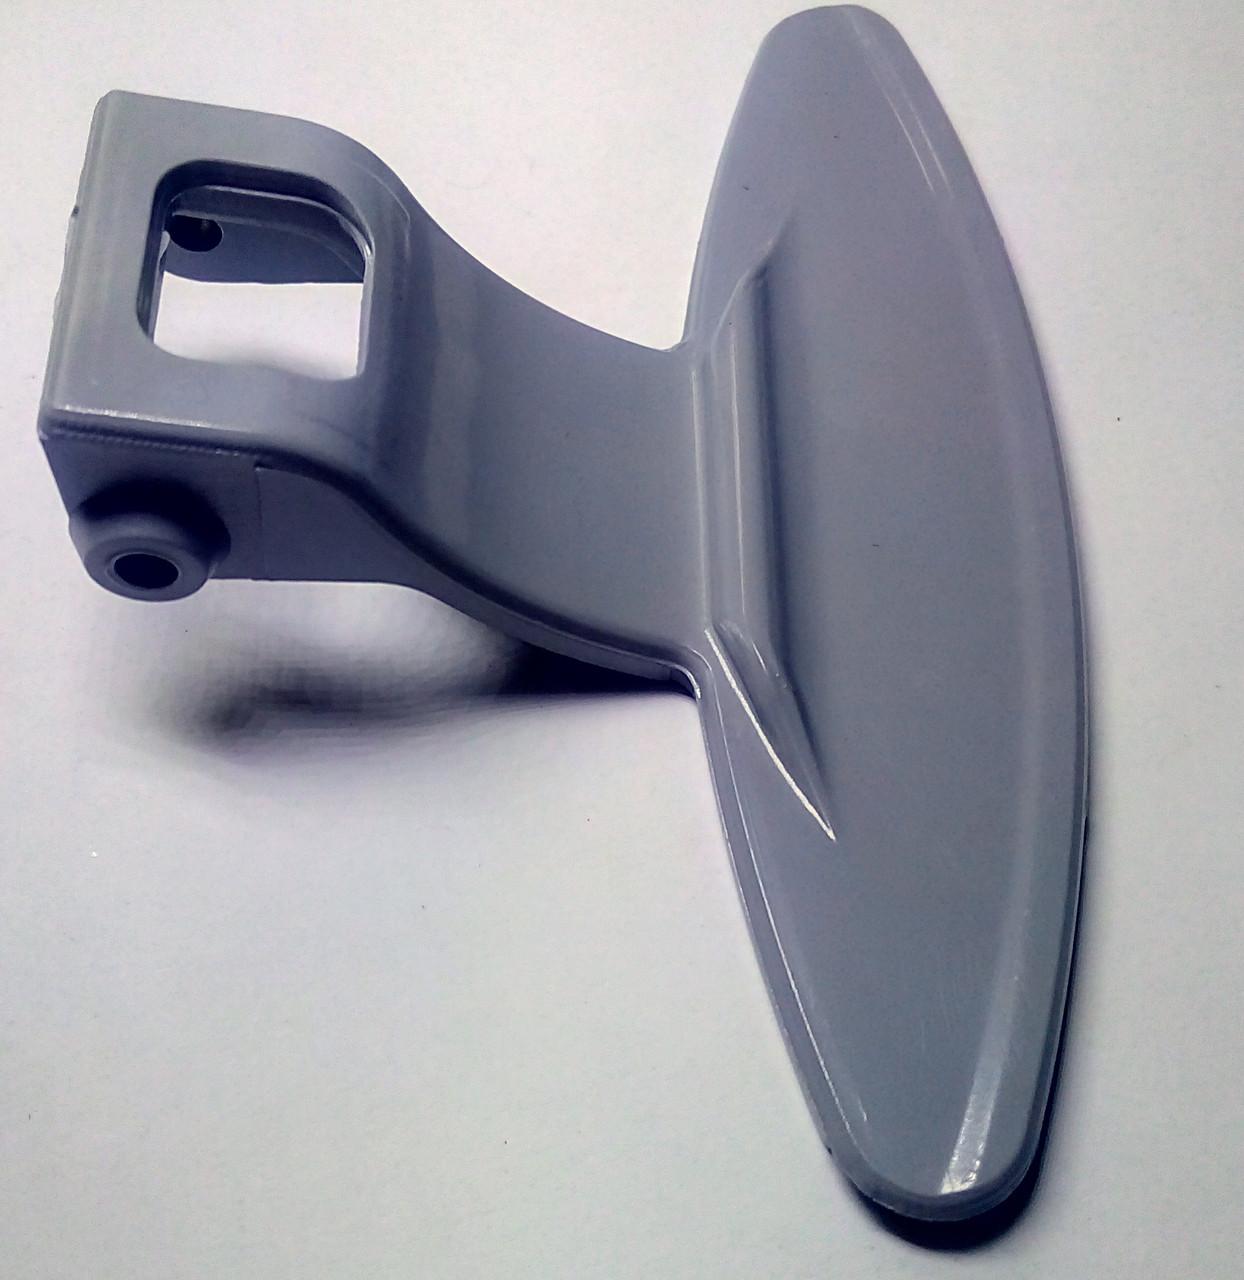 Ручка люка LG сіра (3650ER3002B)